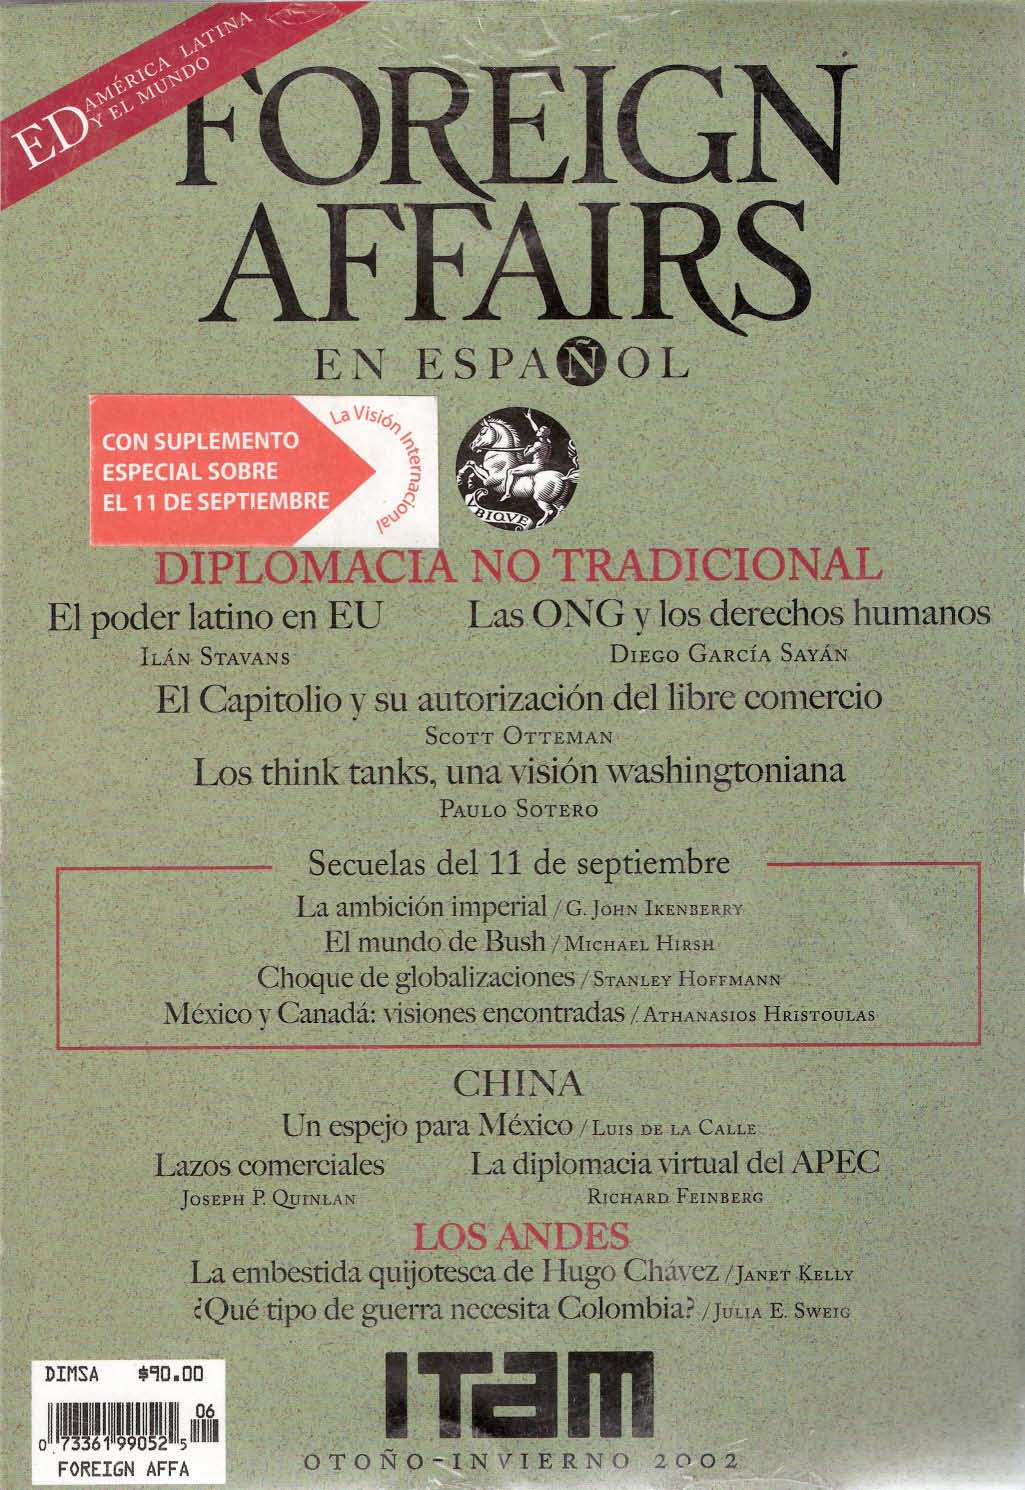 PortadaFAL02-3